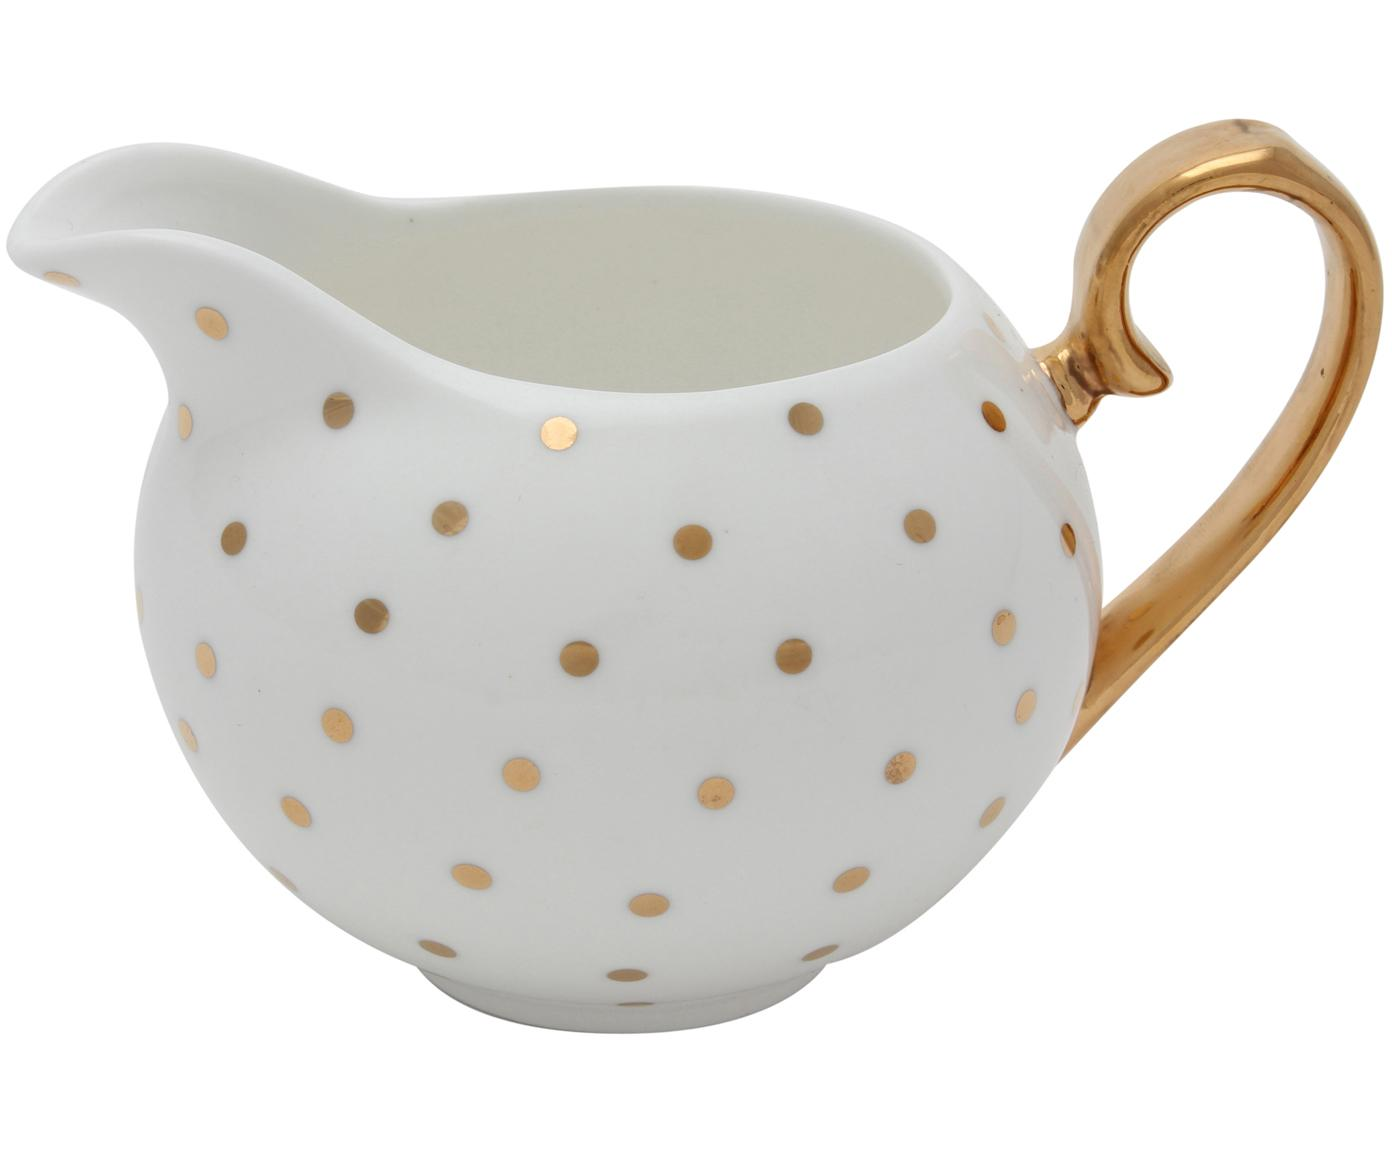 Brocca da latte Miss Golightly, Porcellana cinese, dorato, Bianco, dorato, Ø 6 x Alt. 7 cm